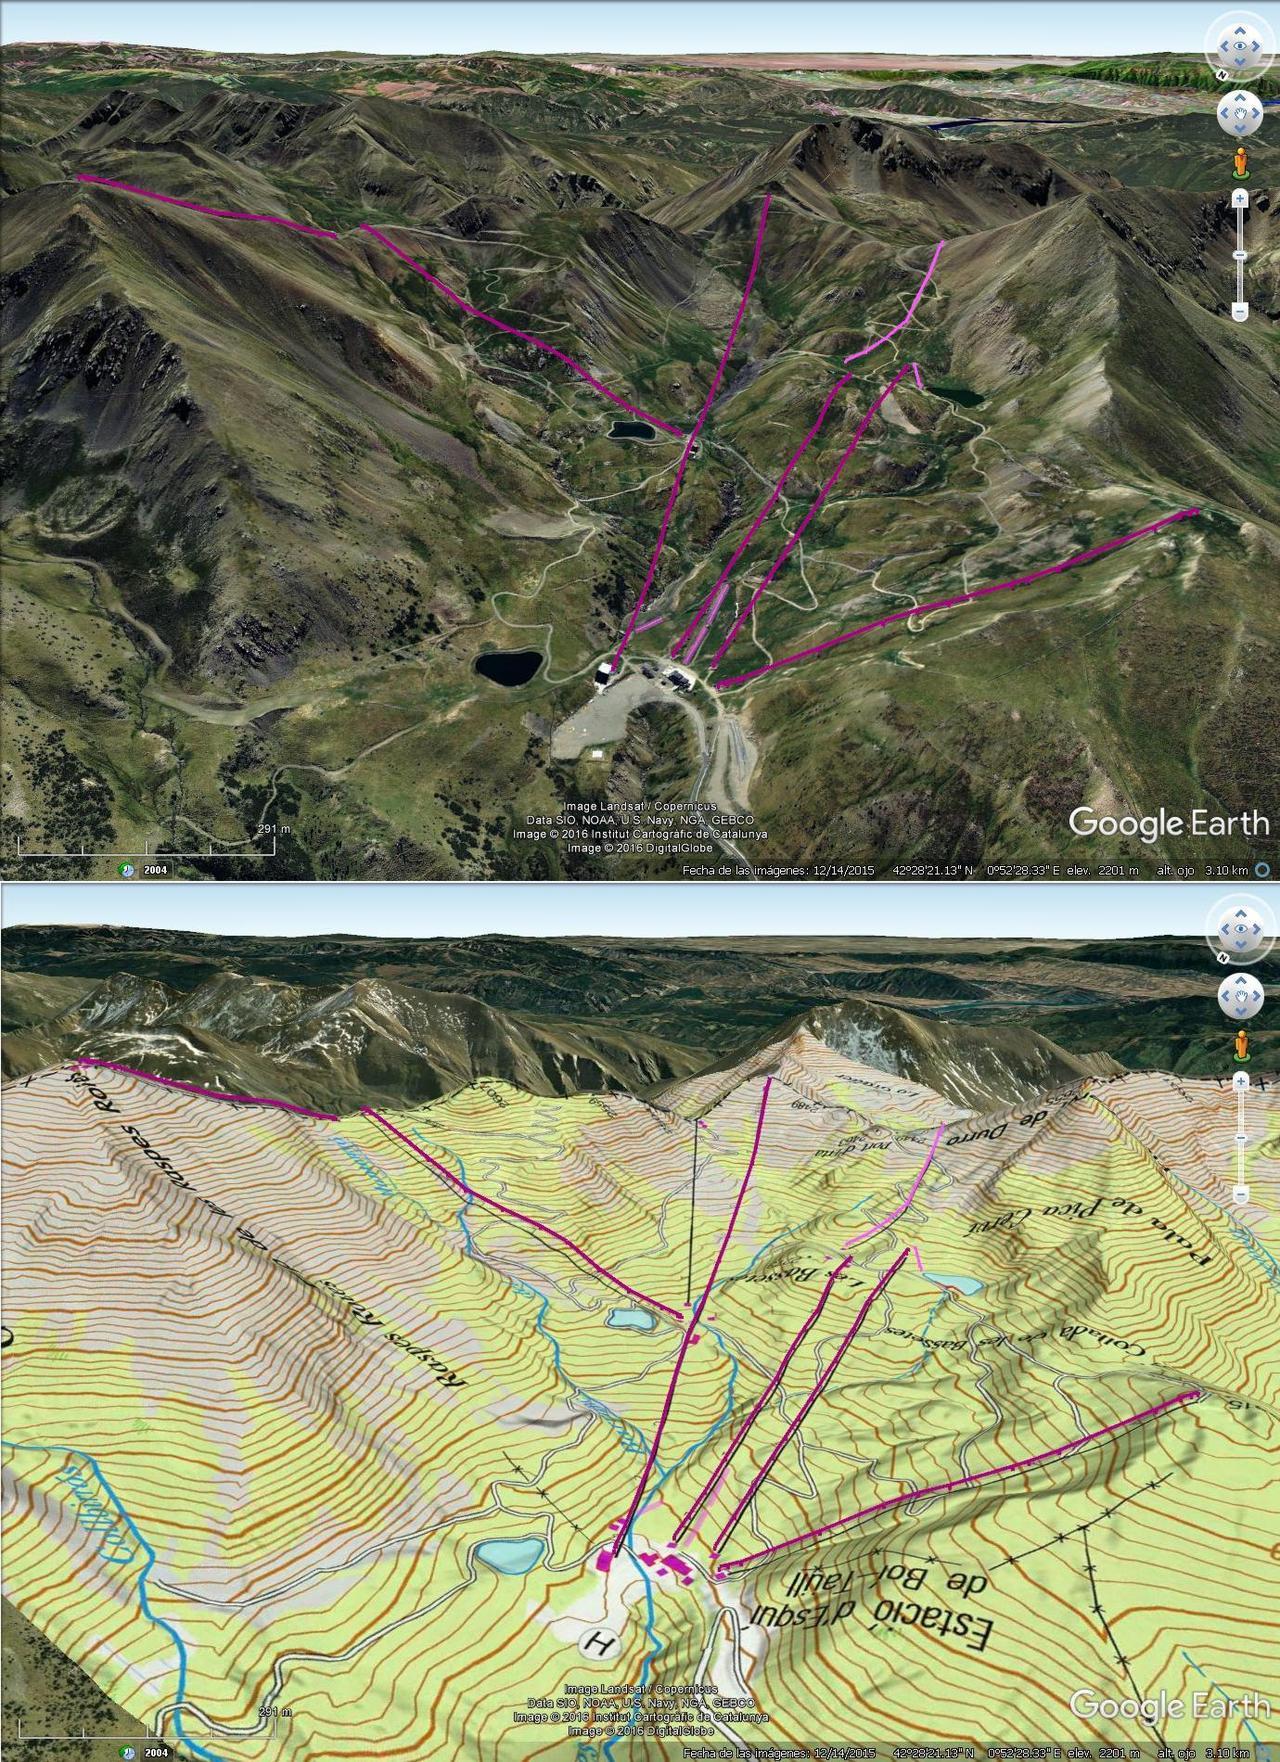 Vistas Google Earth Boi Taüll 2016-17